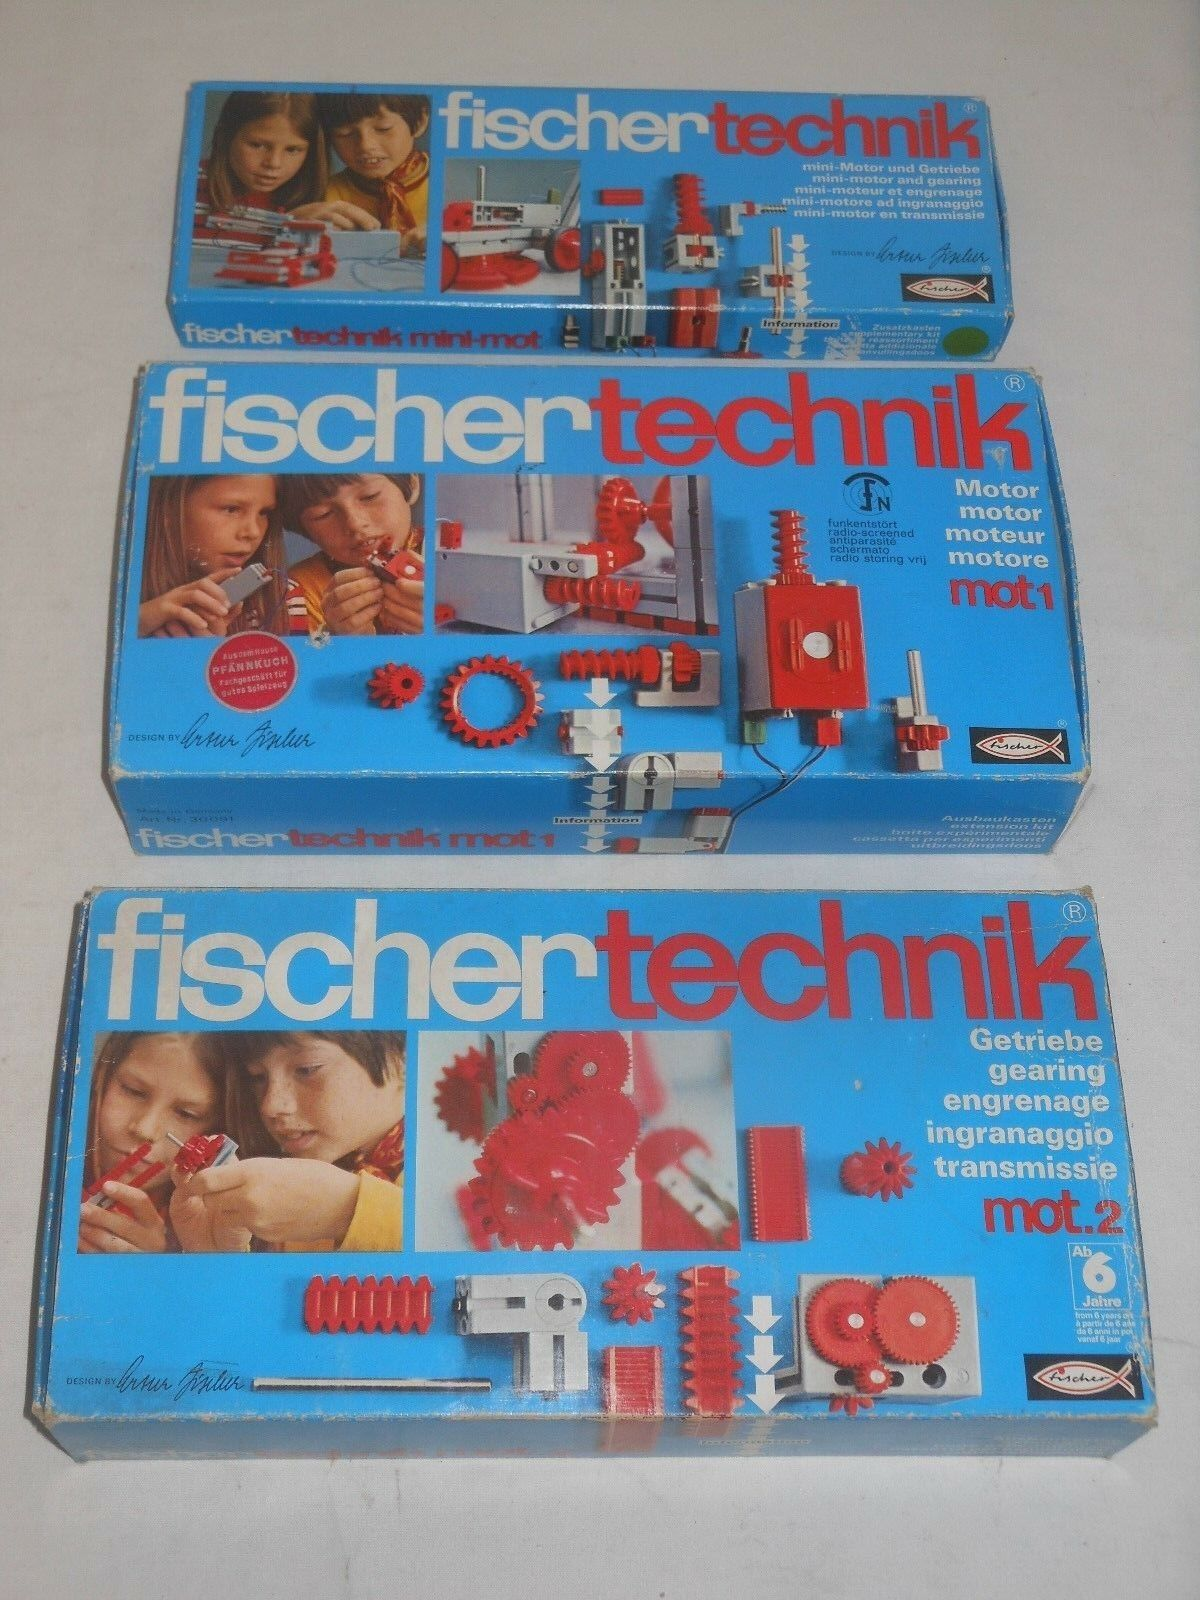 Fischertechnik Lot Sets Mot. 1 Motor + Mot. 2 Transmission + Mini Motor Gearbox